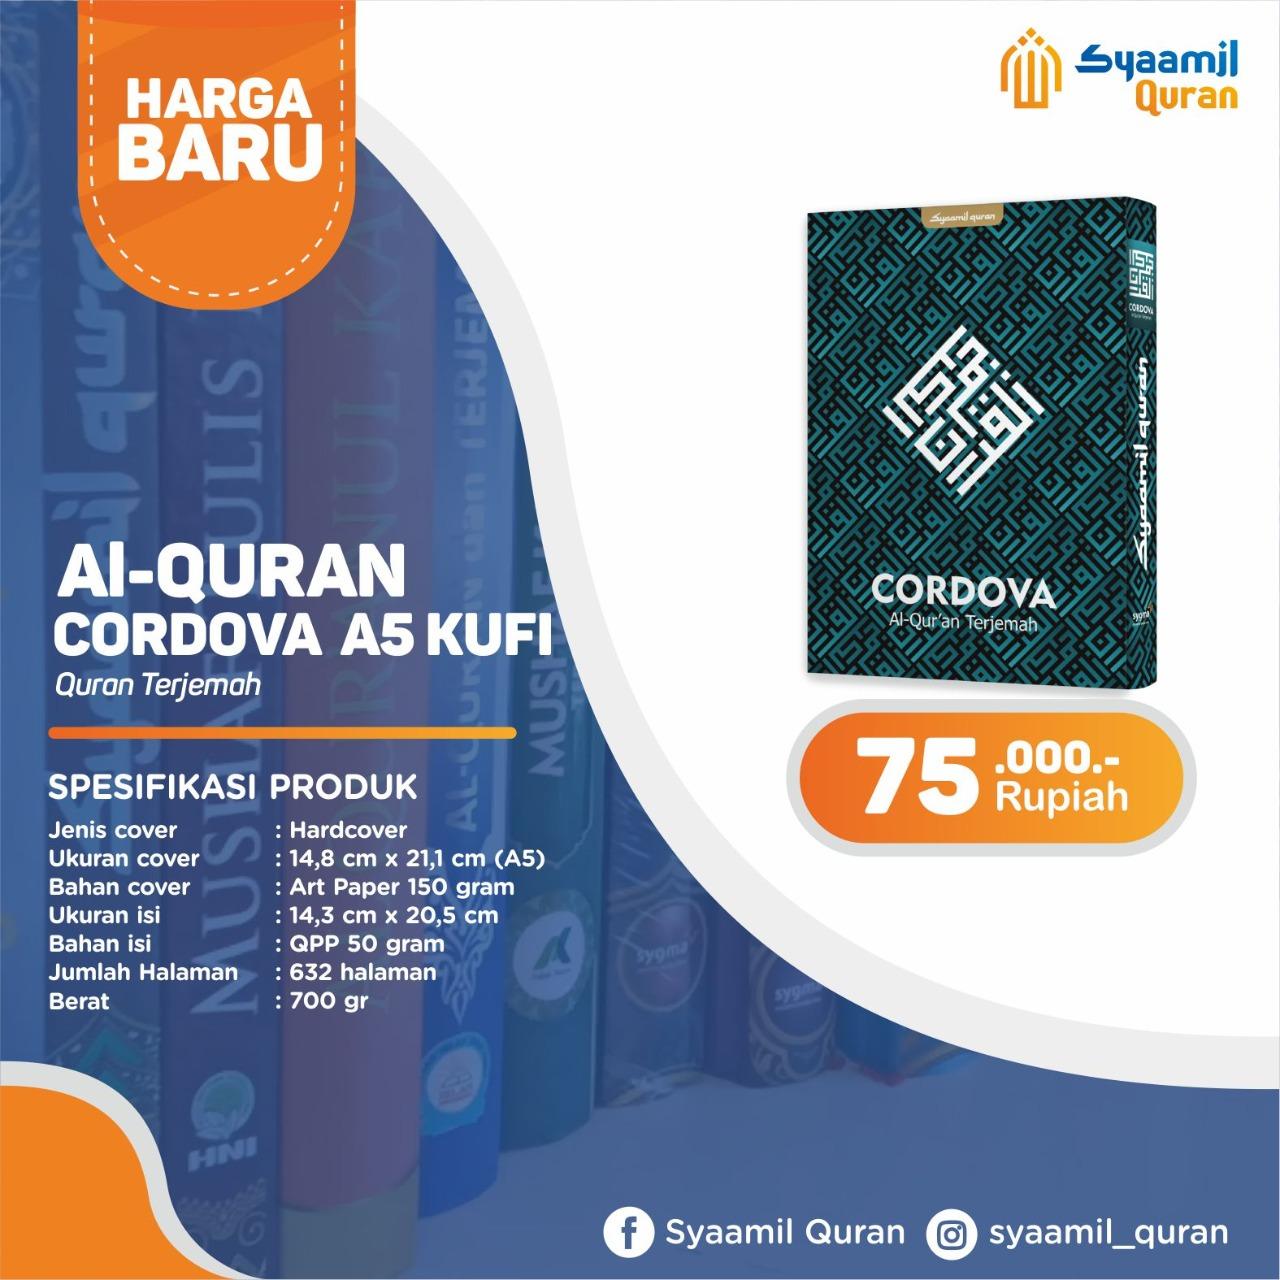 Jual Produk Syaamil Qur'an, Al-Qur'an Cordova A5 Kufi: Al-Qur'an Terjemah